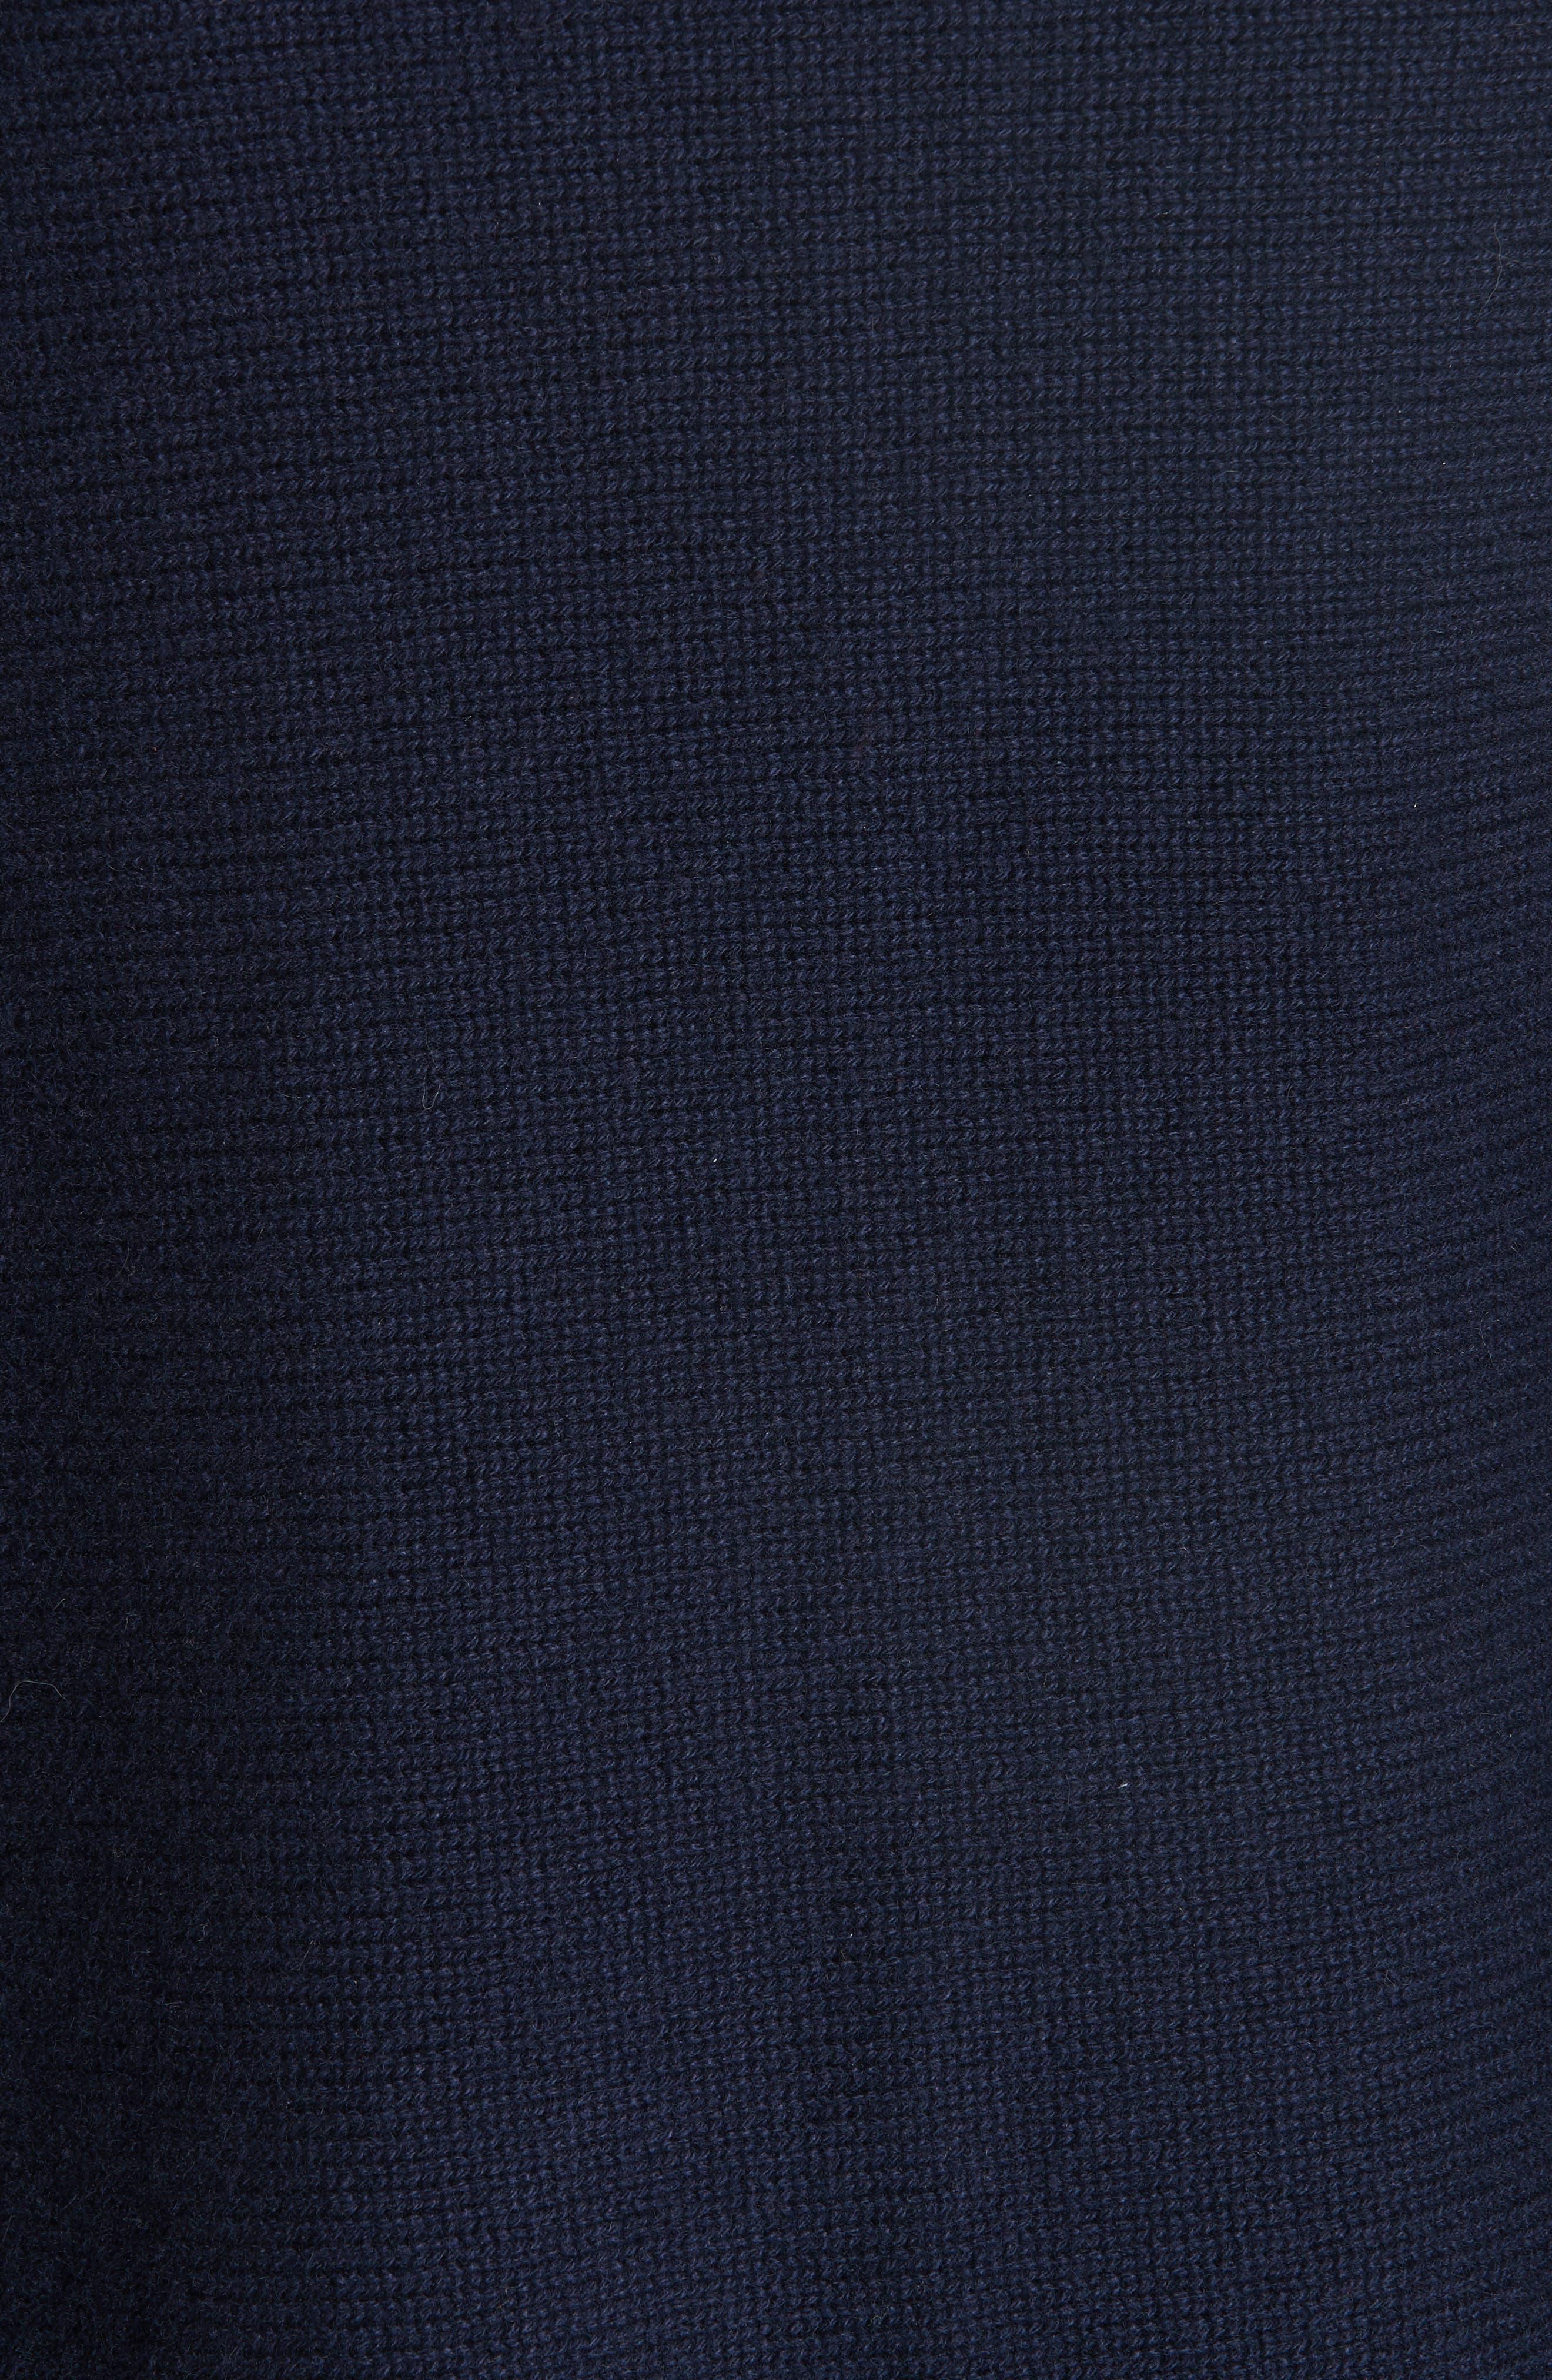 Cashmere & Genuine Mink Fur Wrap,                             Alternate thumbnail 5, color,                             ULTRAMARINE NAVY